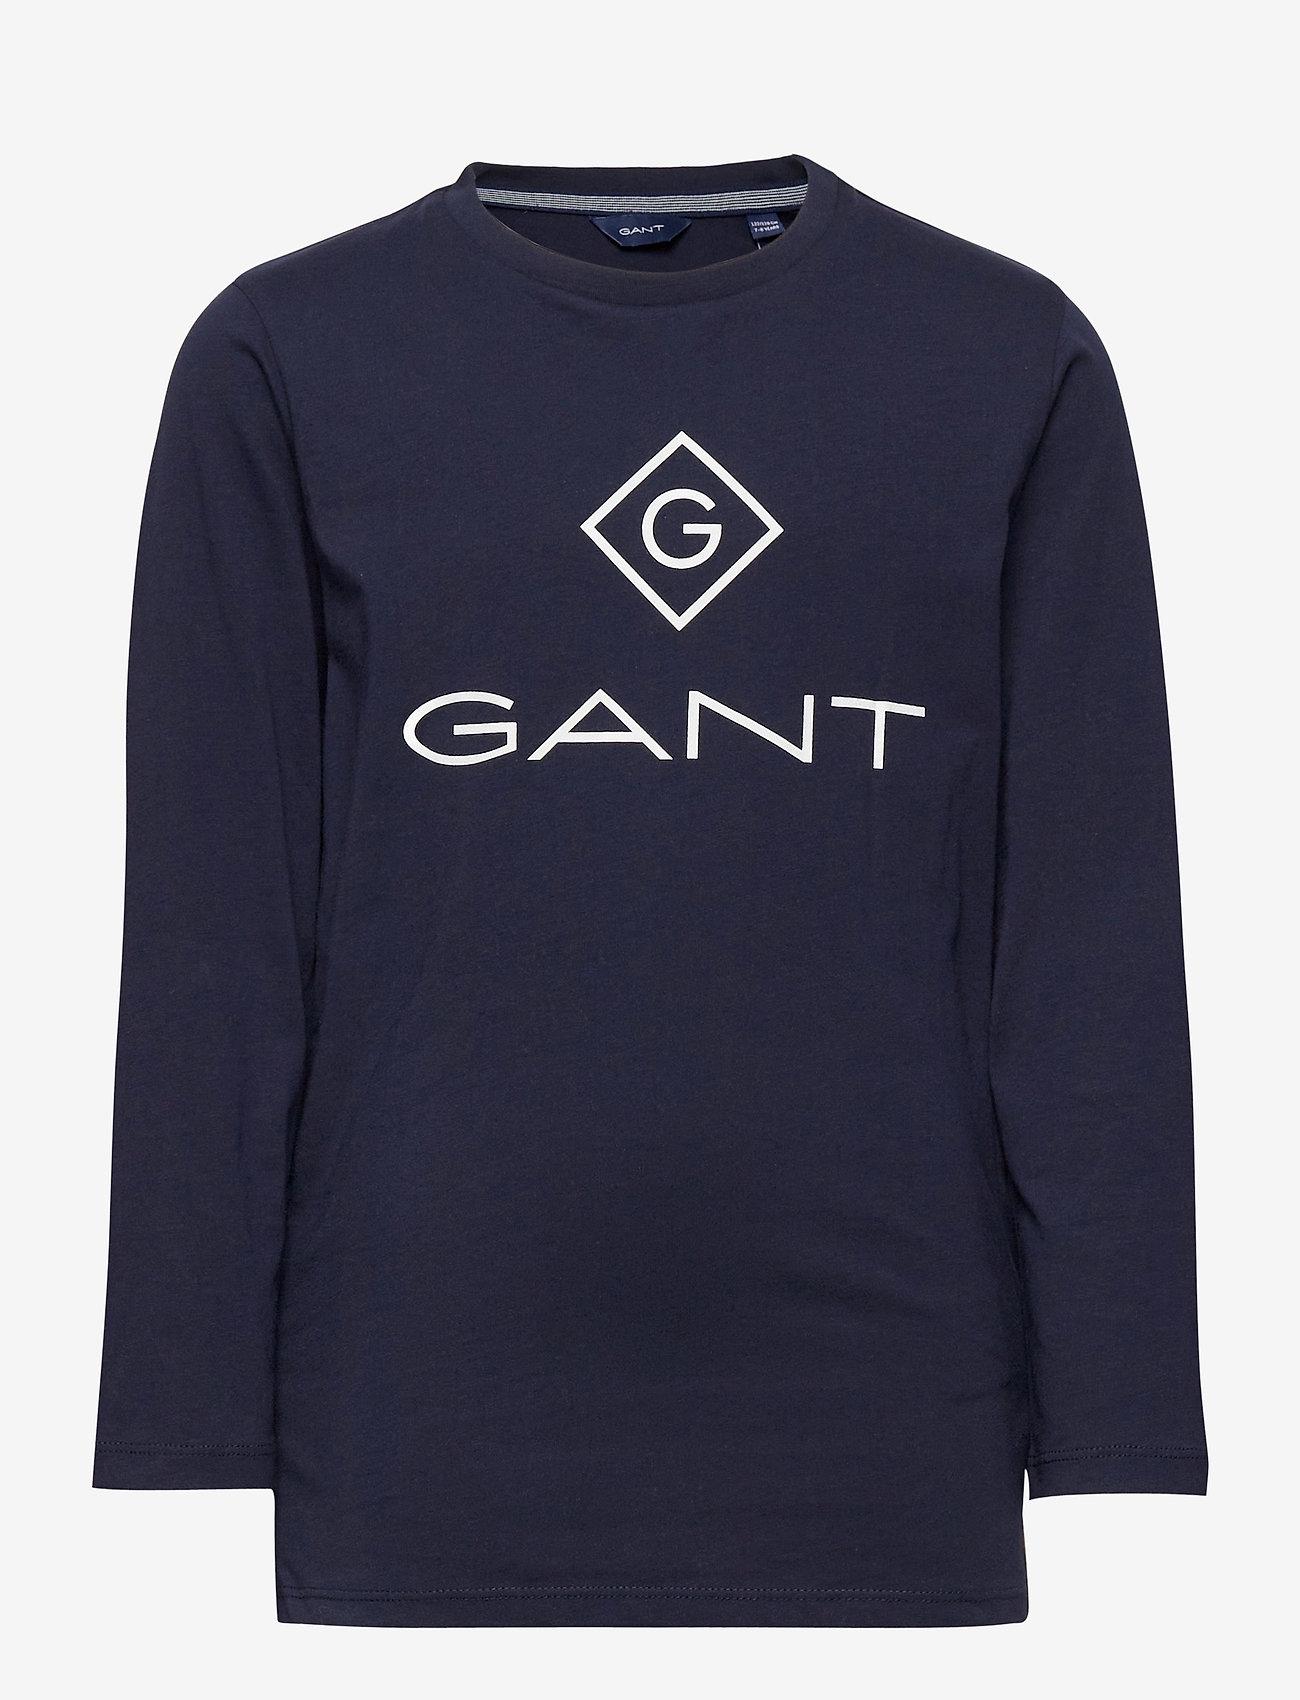 GANT - GANT LOCK-UP LS T-SHIRT - long-sleeved t-shirts - evening blue - 0